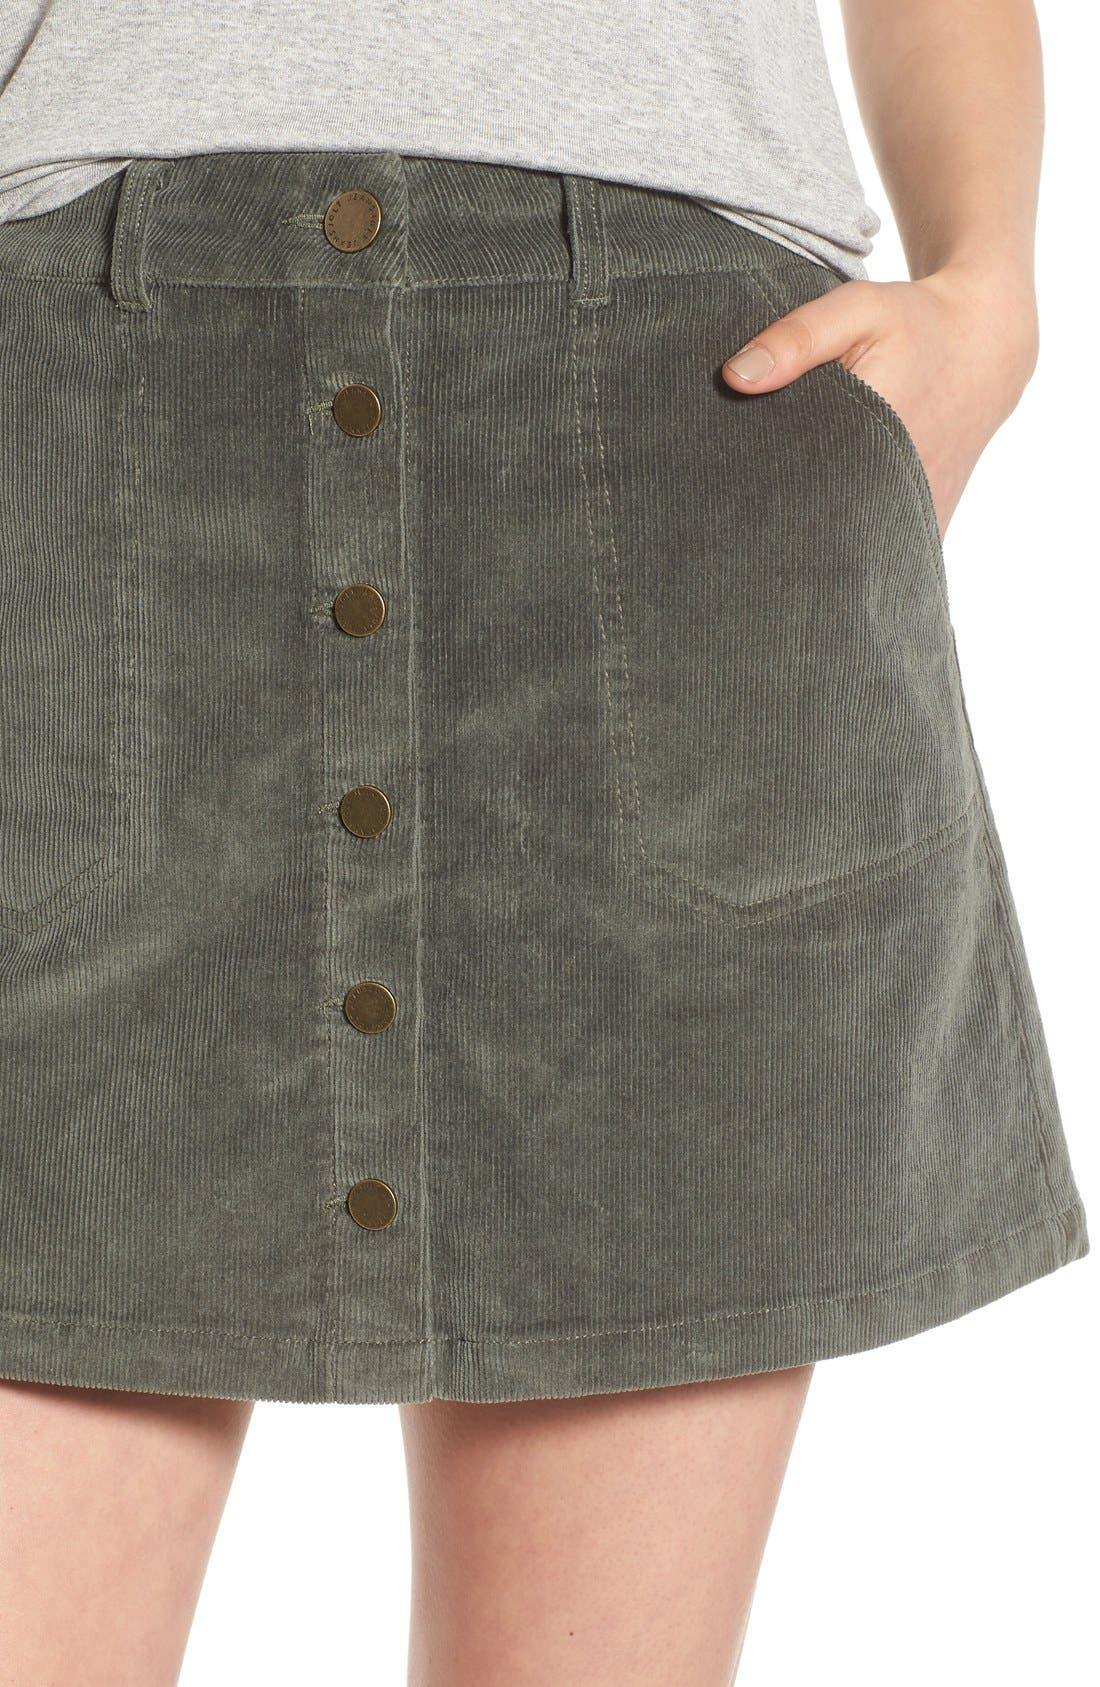 JOLT, Corduroy A-Line Skirt, Alternate thumbnail 5, color, 300